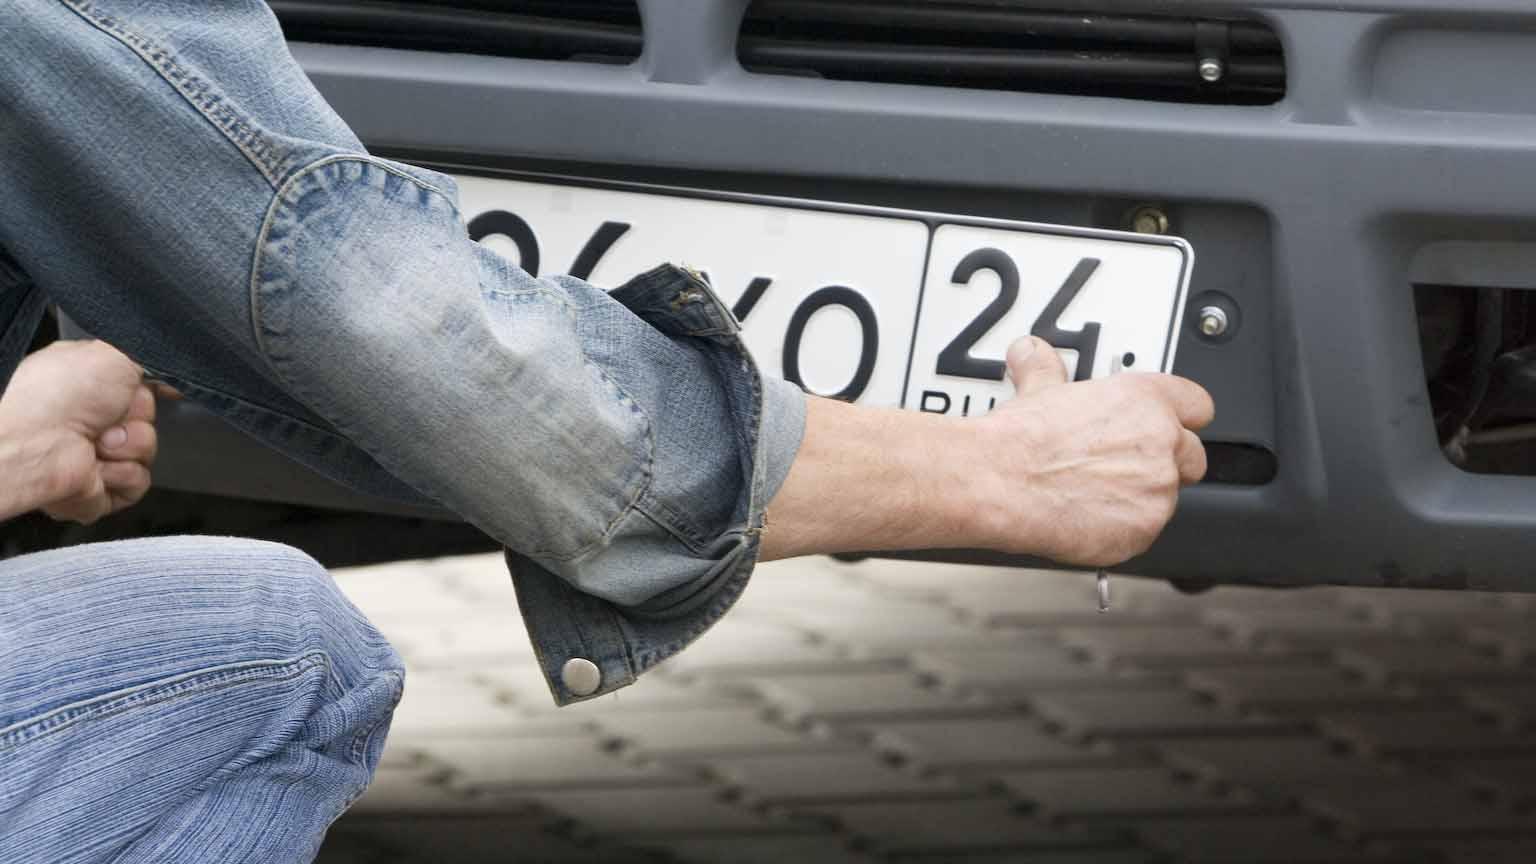 Снять авто с учета без авто: как снять без документов, номеров, без владельца, утилизации, хозяина, снимают ли без авто